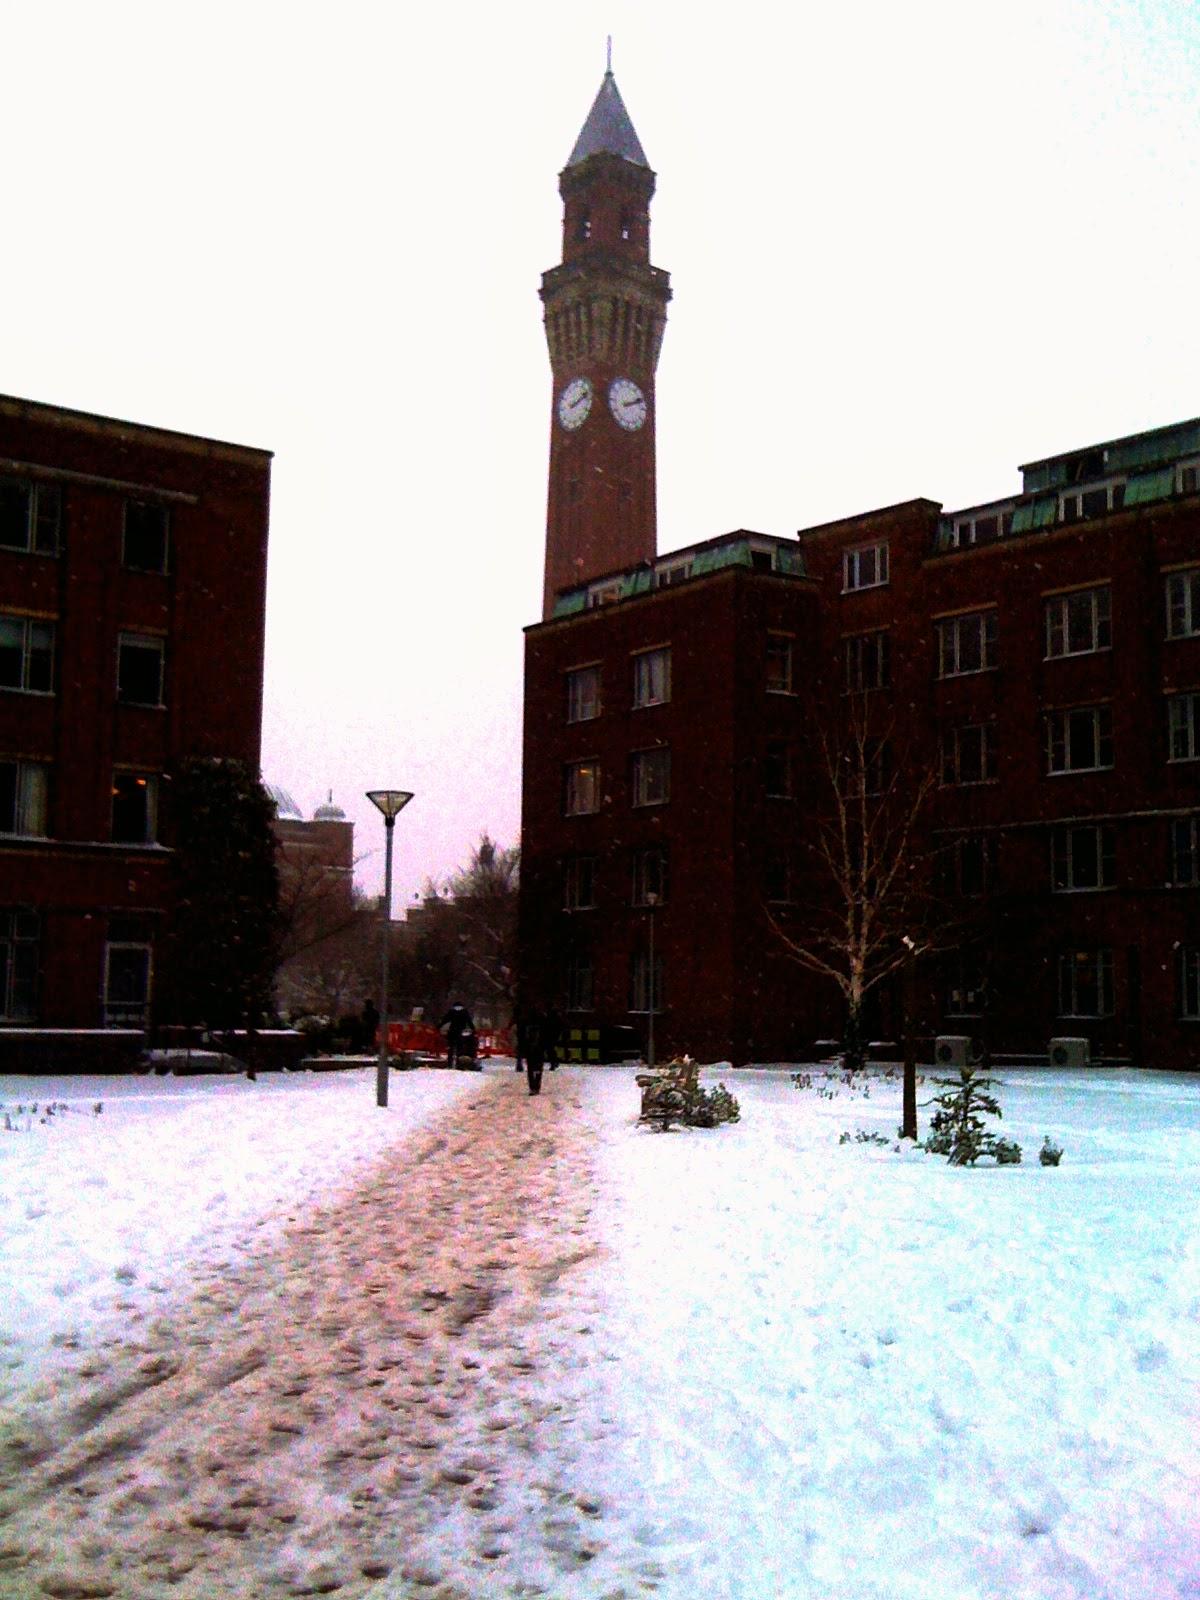 Birmingham University Clock Tower